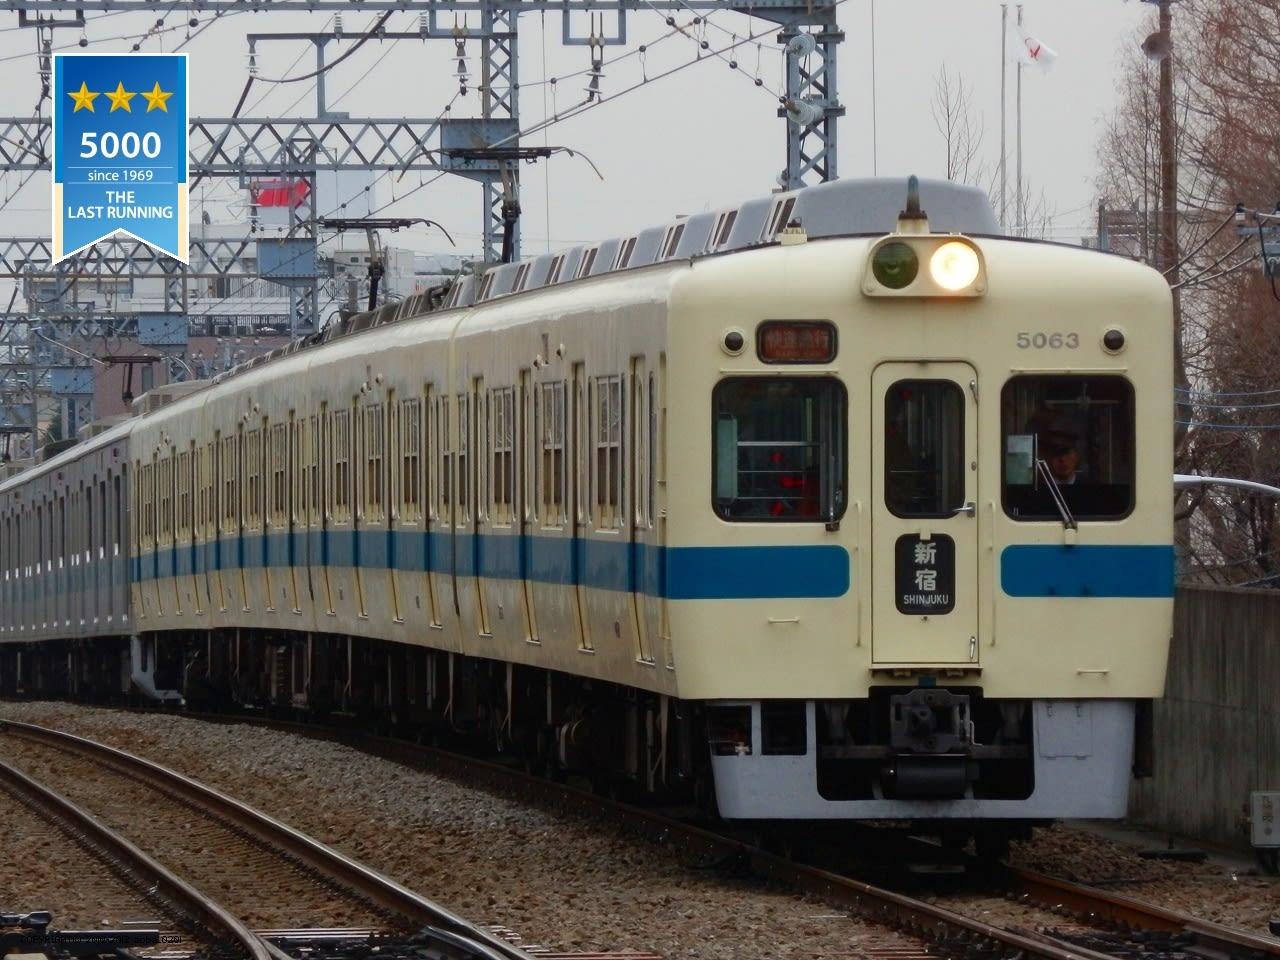 小田急5000形 壁紙置き場 列車番号1042の部屋